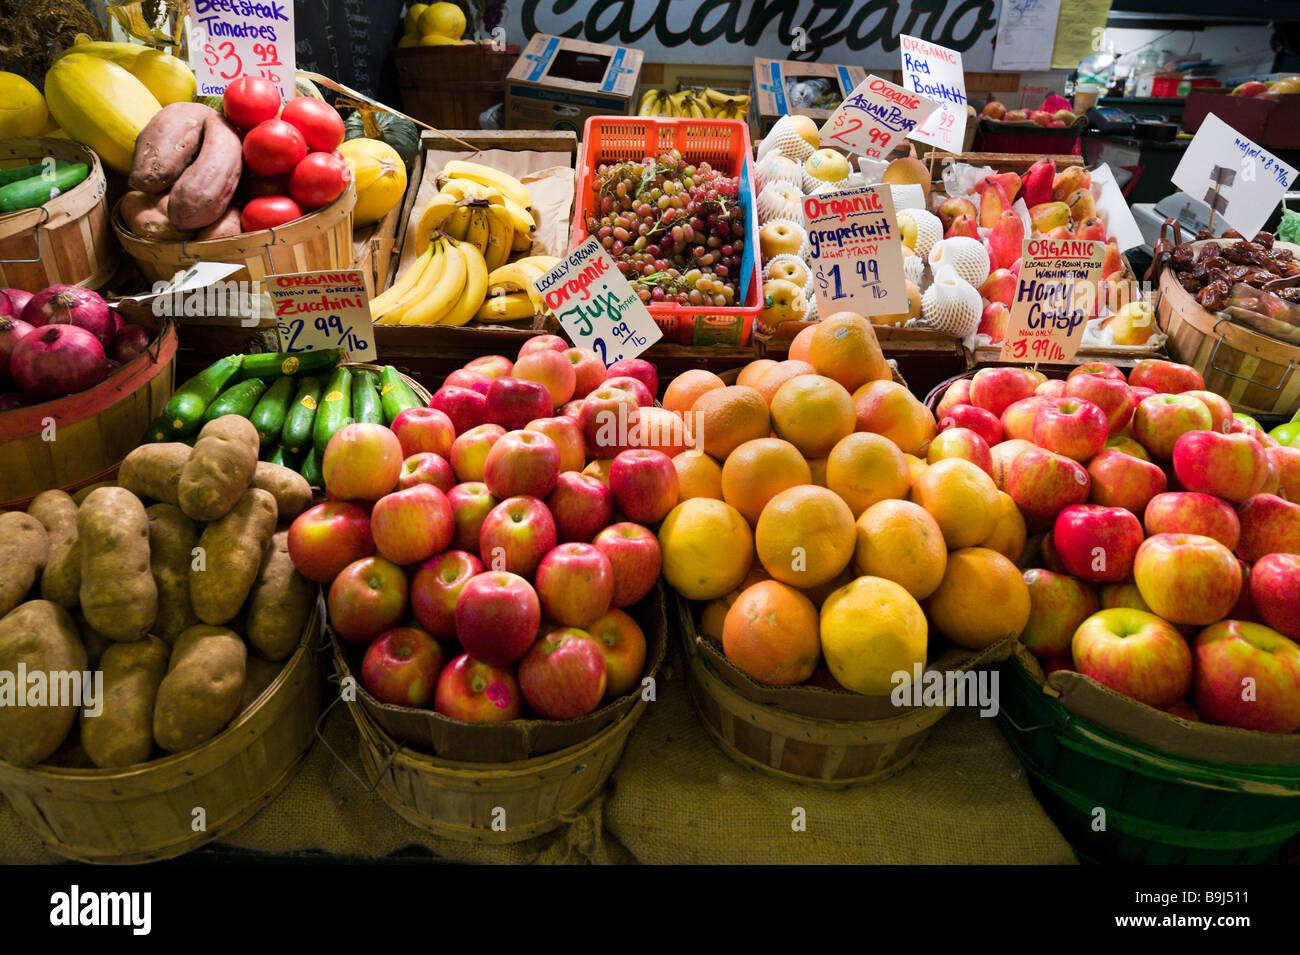 Produce stall, Pike Place Market, downtown Seattle, Washington, USA - Stock Image